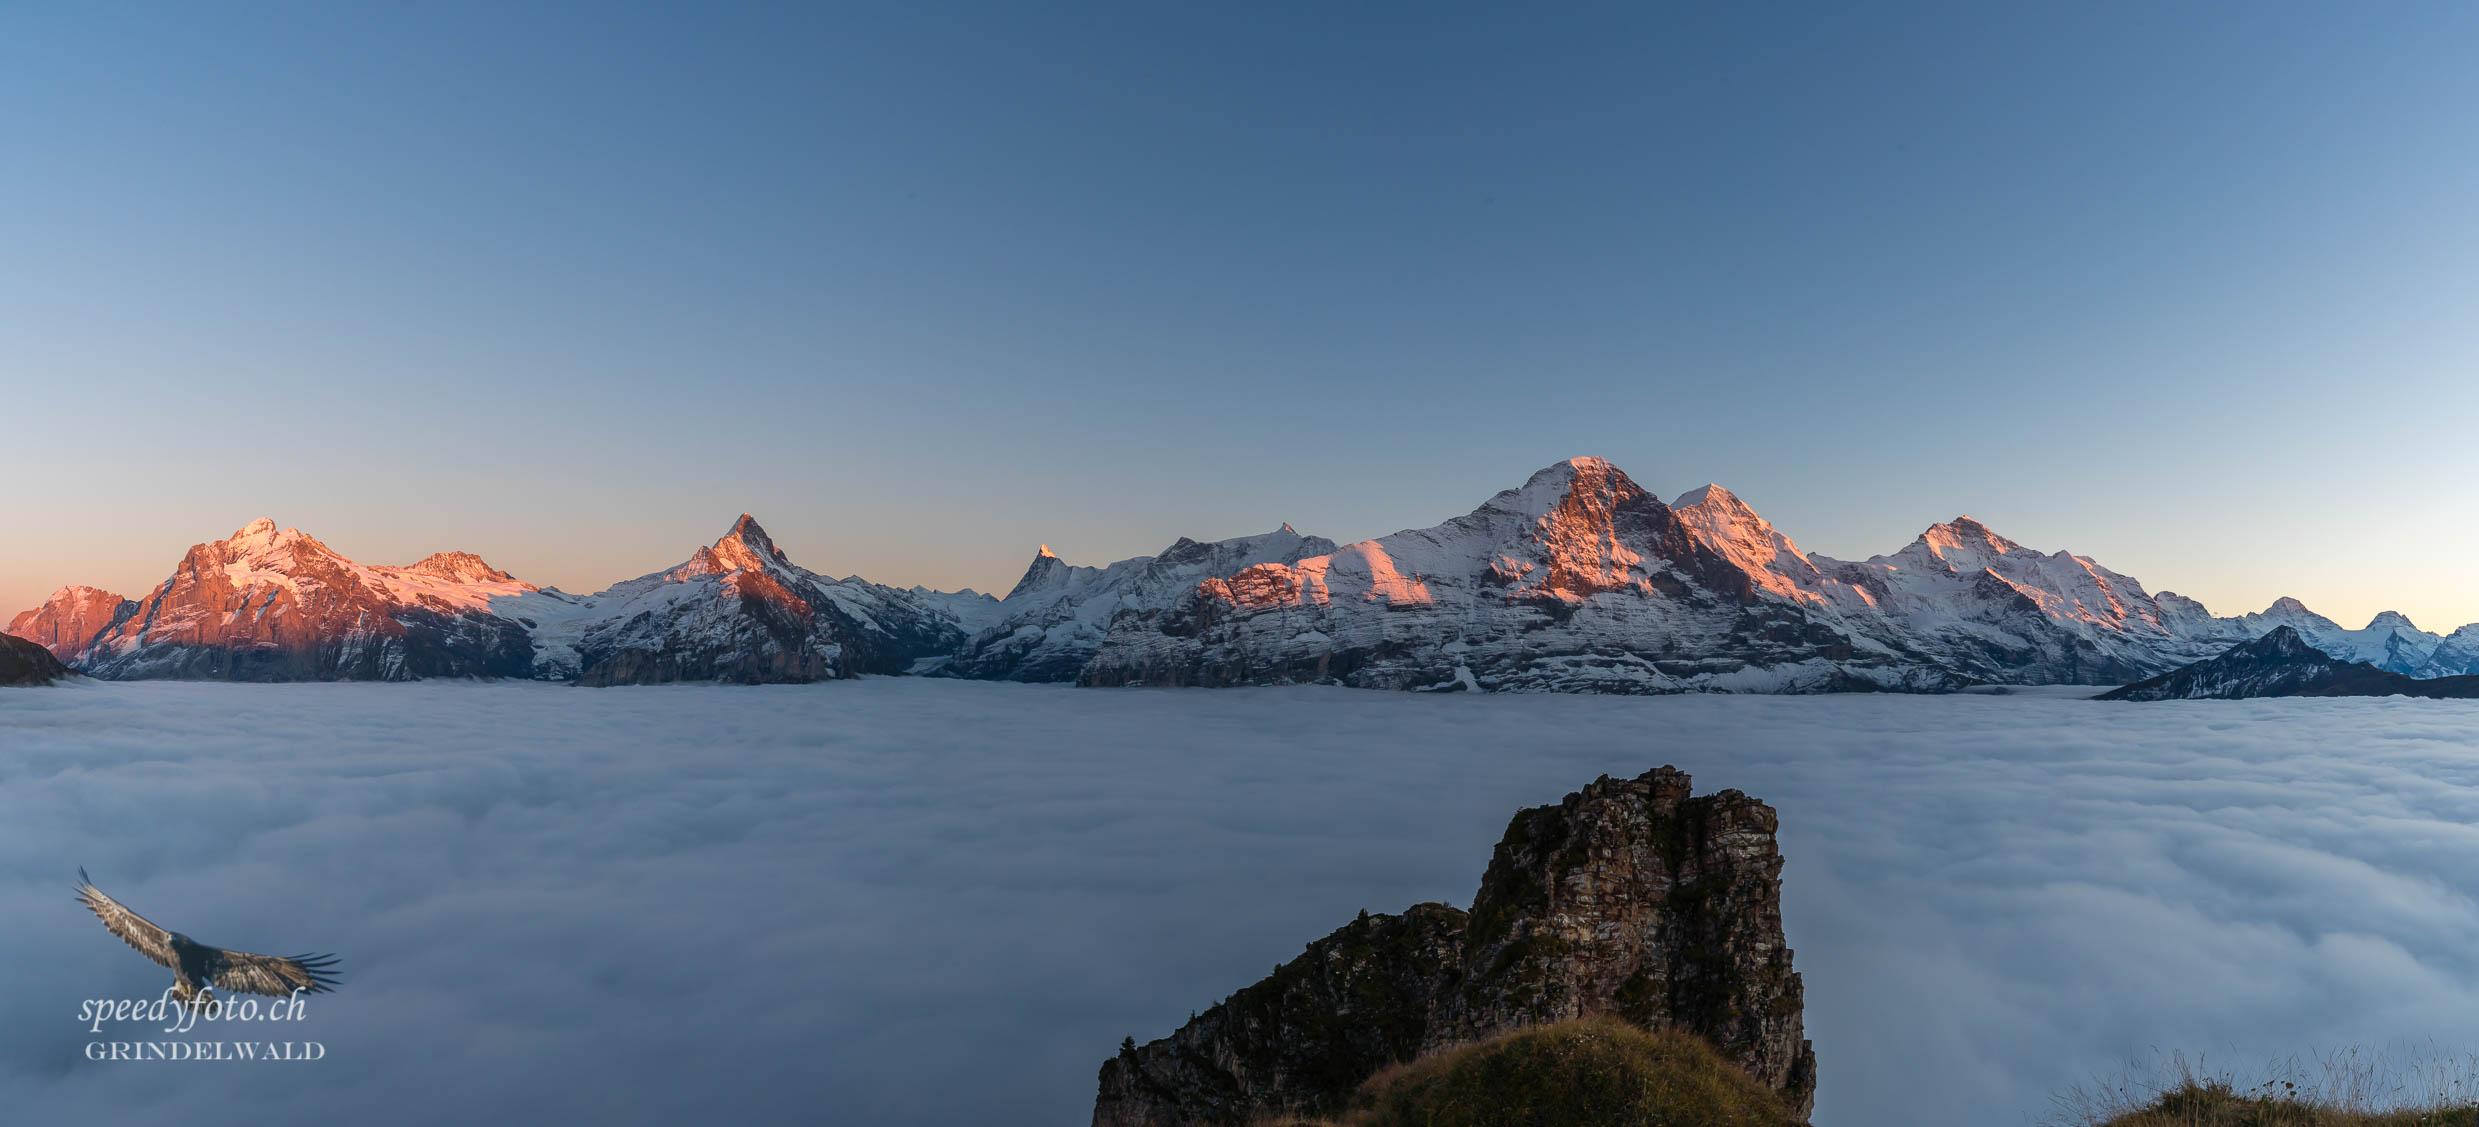 Nebelmeer Panorama - Grindelwald